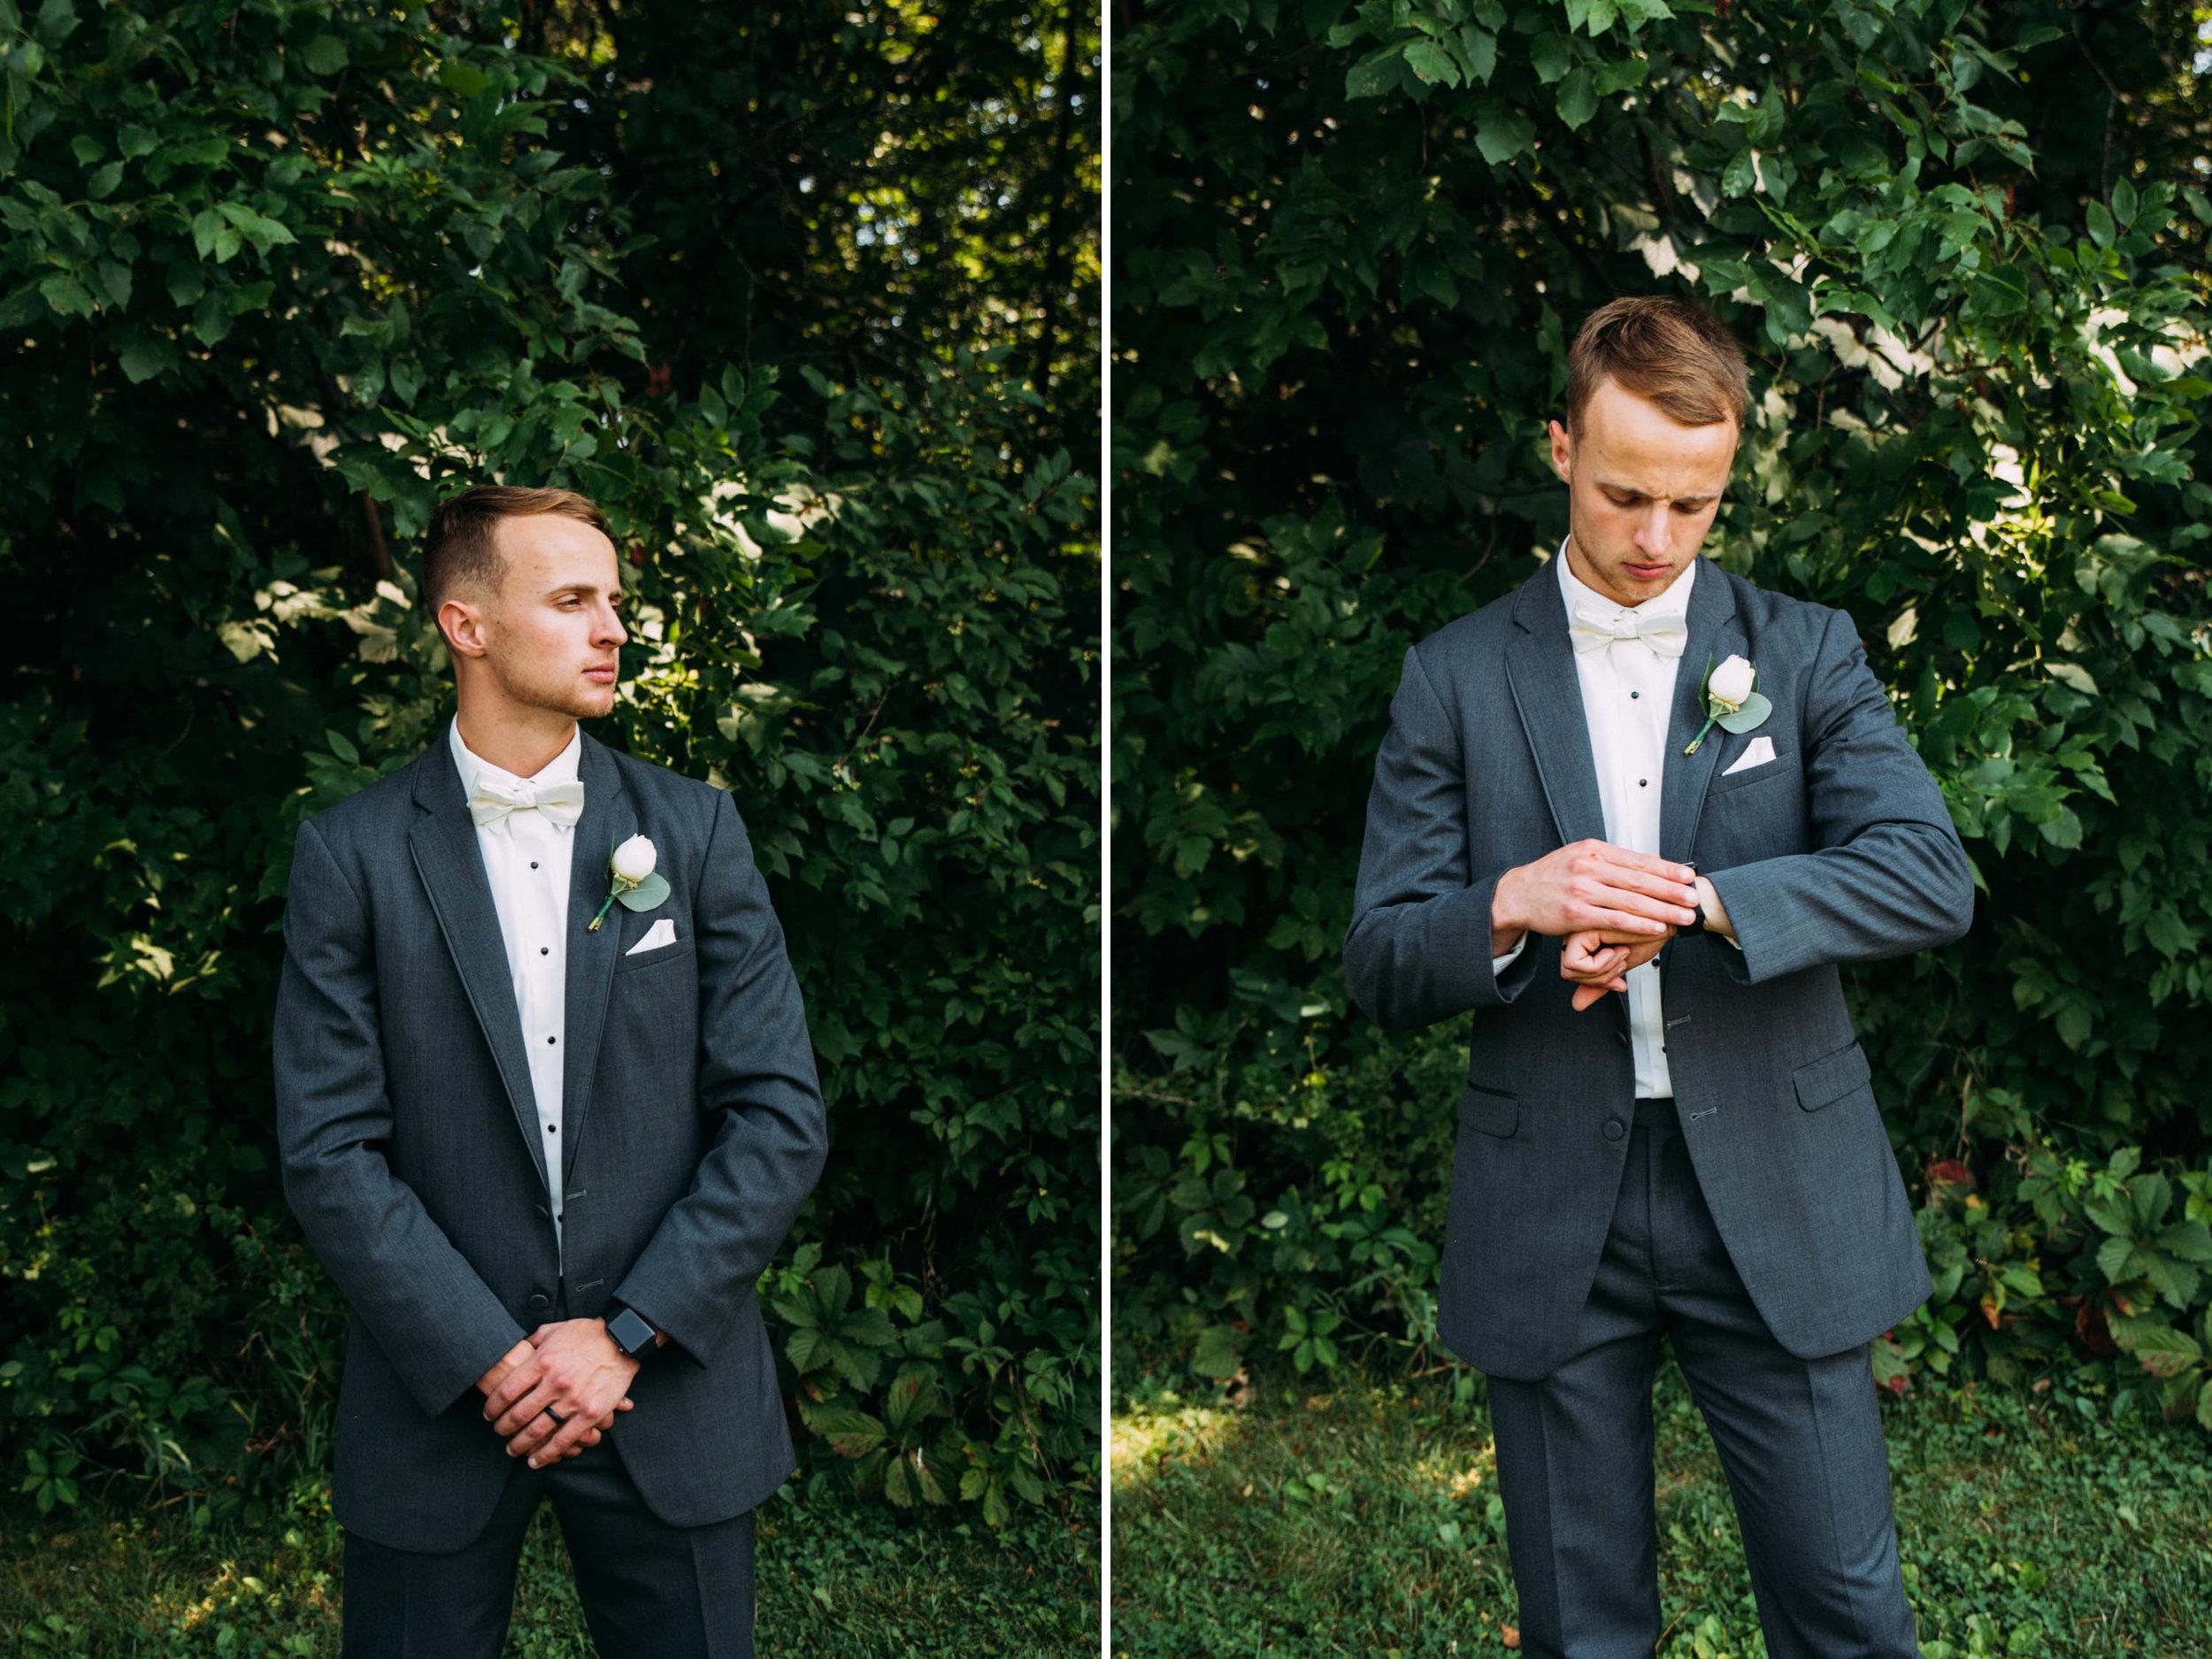 11-Minnetonka Orchards Wedding Ashley Bryce Blog.jpg